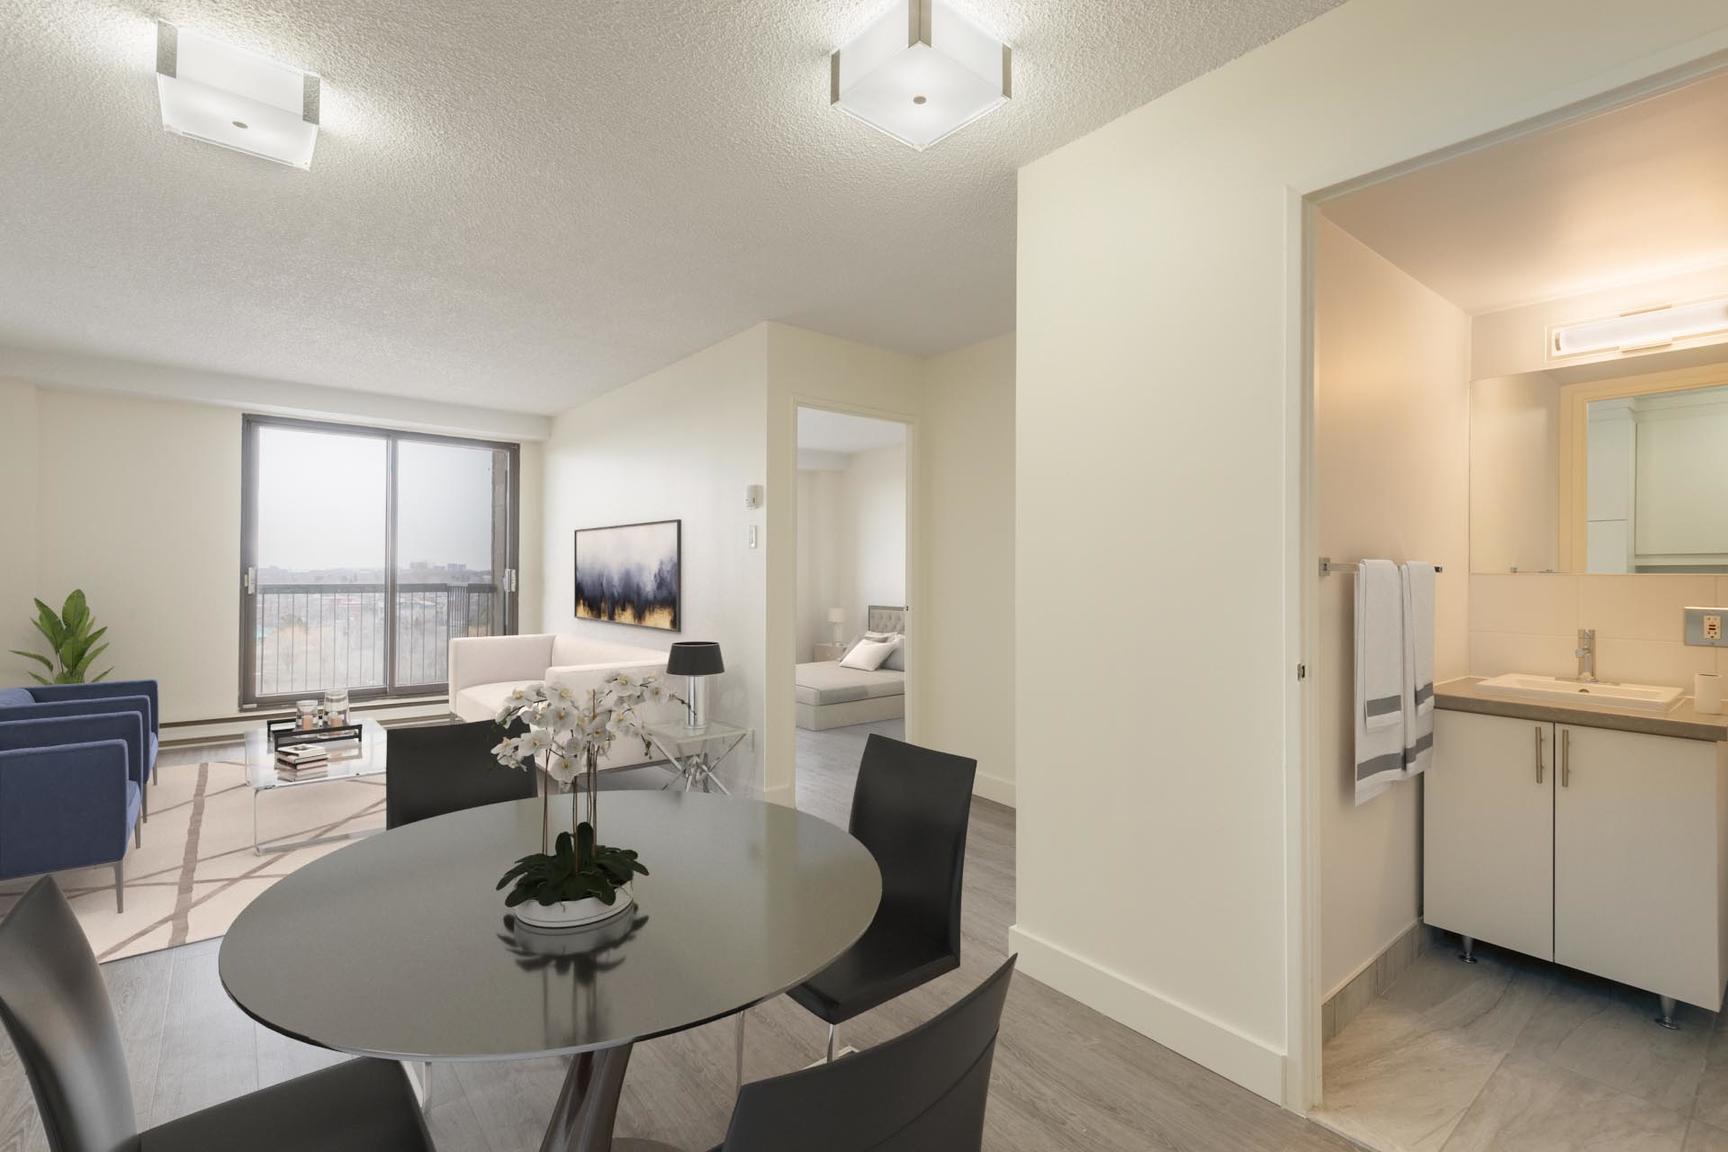 1 bedroom Apartments for rent in Laval at Le Quatre Cent - Photo 11 - RentersPages – L407184